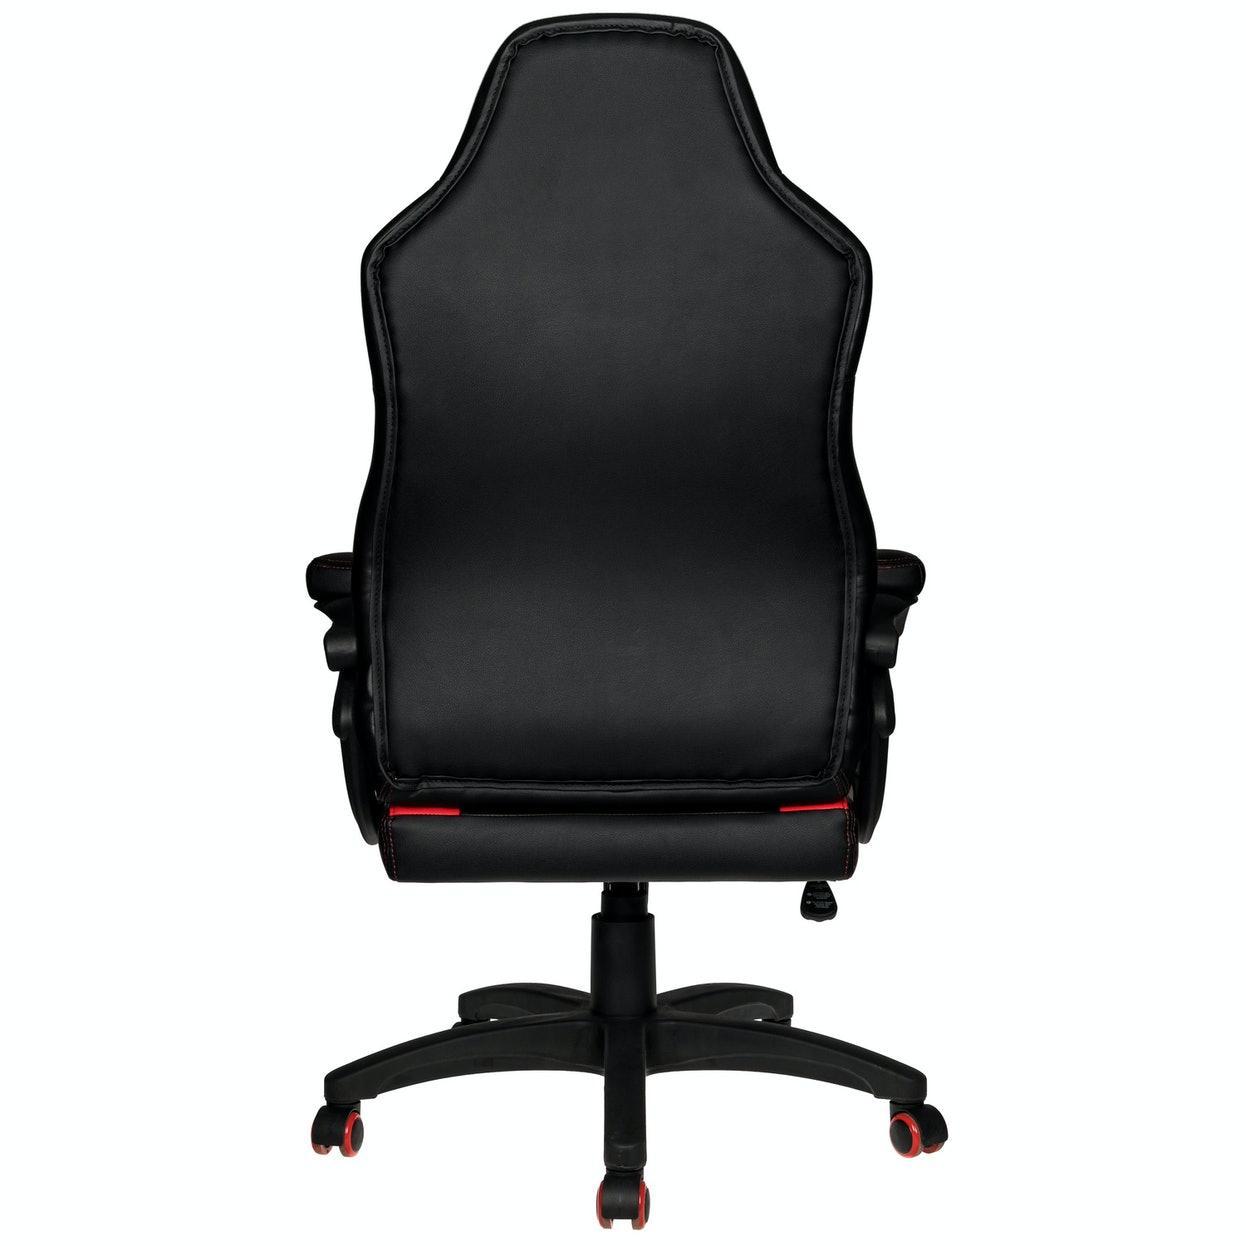 Геймърски стол Nitro Concepts C100 - Black/Red-3